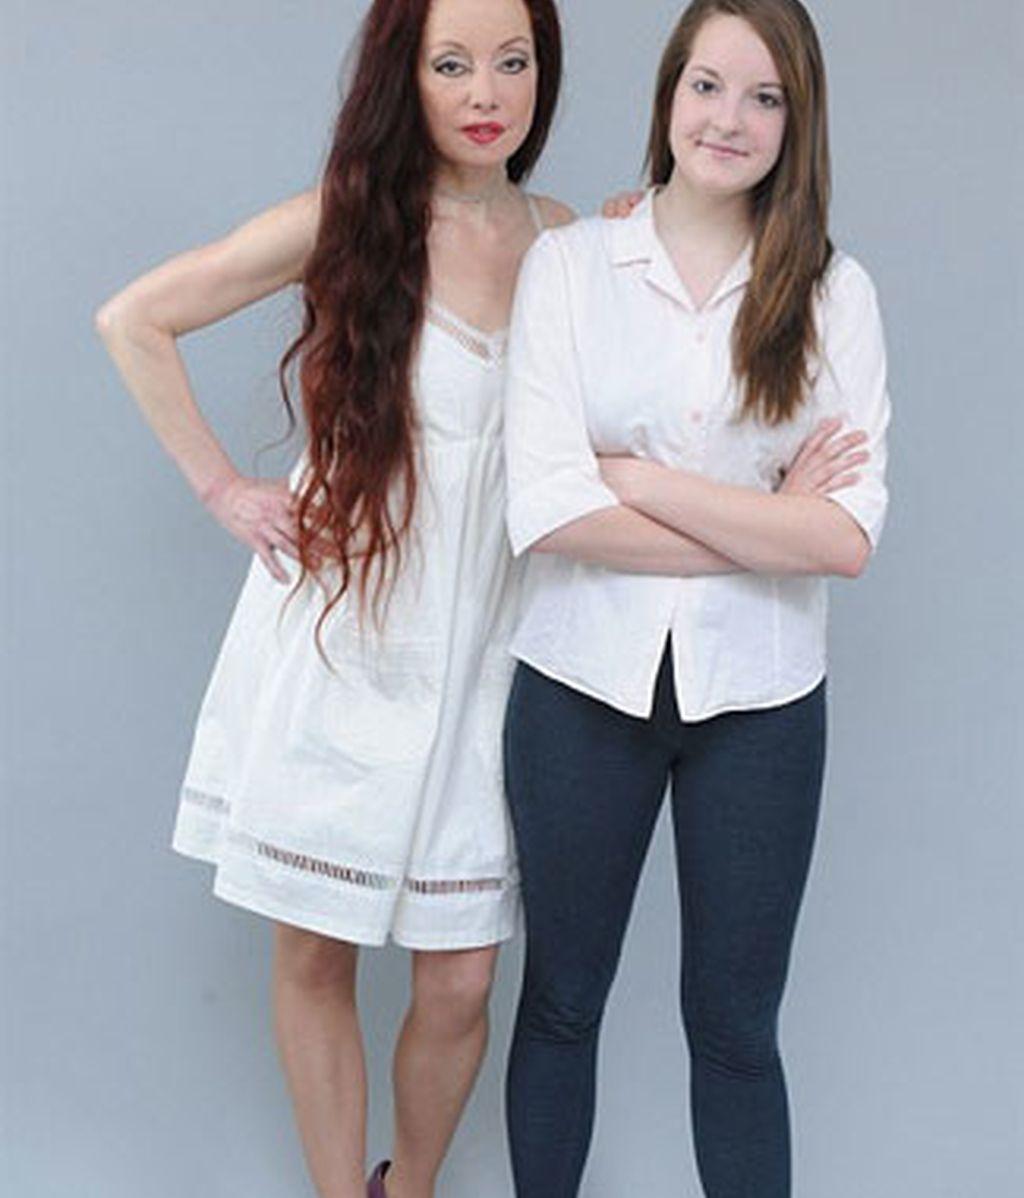 Rachel Namita junto a su madre Nileen. Foto: Mail Online.